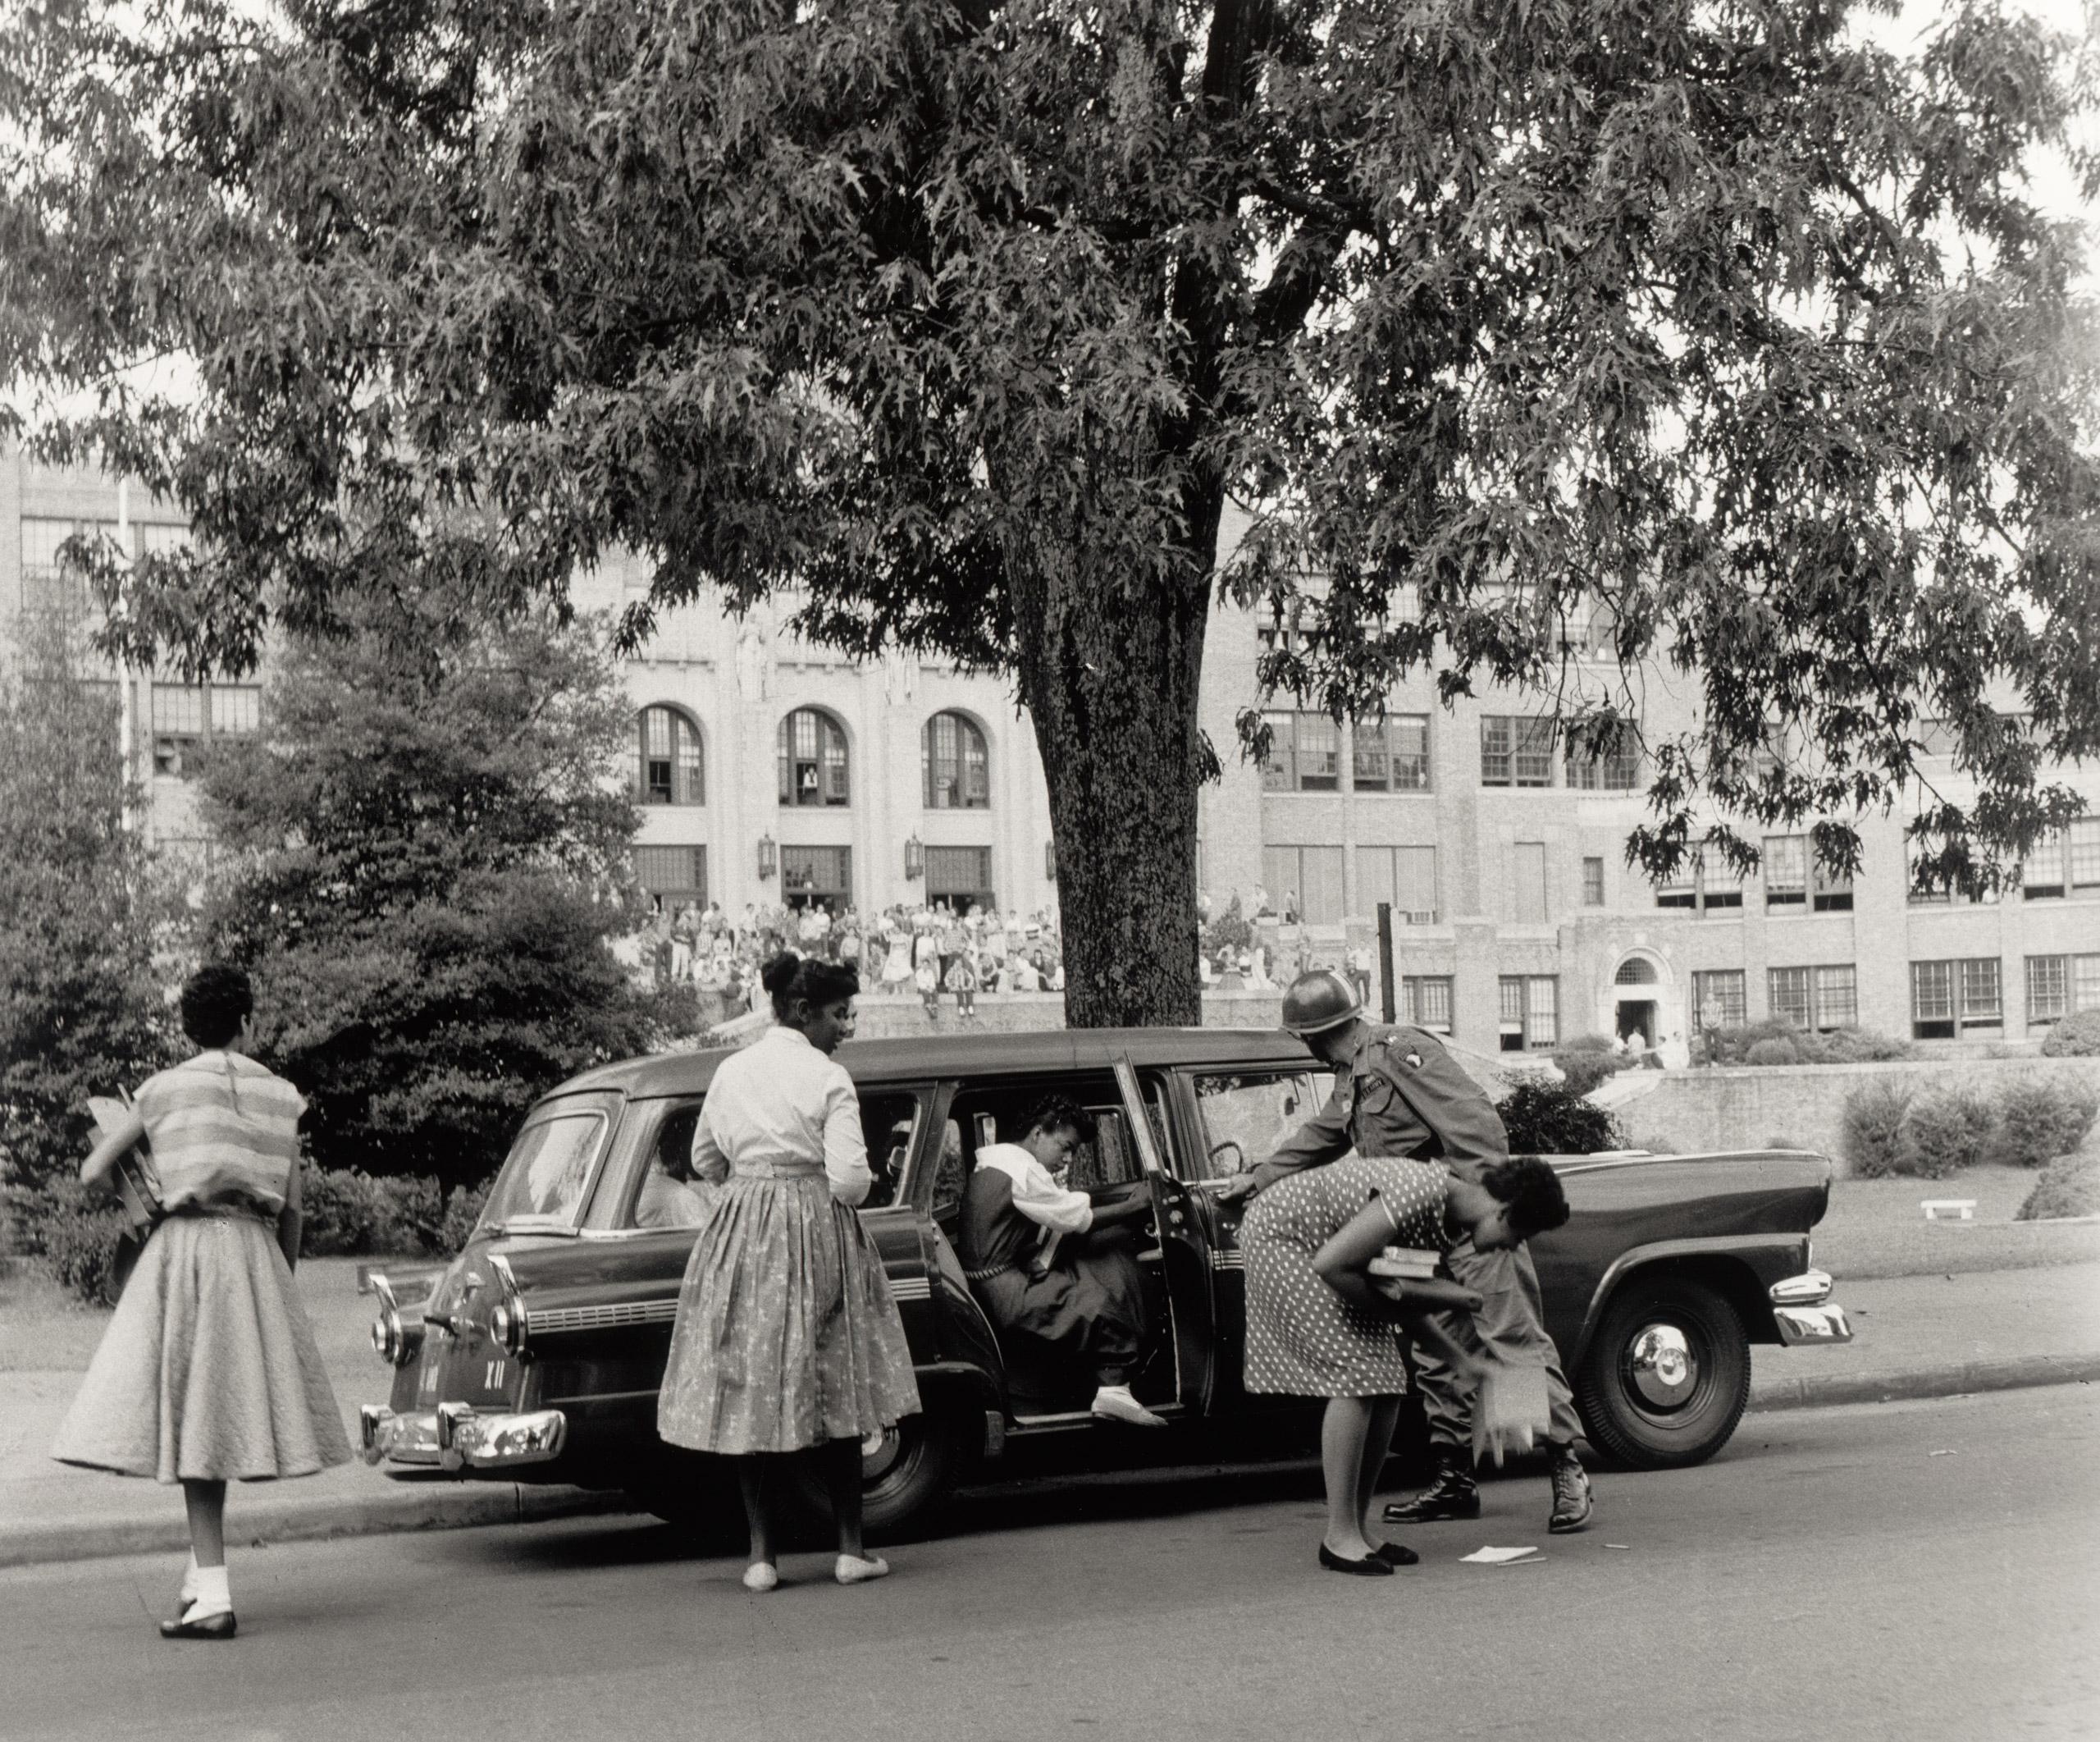 Desegregation of Central High School Little Rock, Arkansas, 1957.